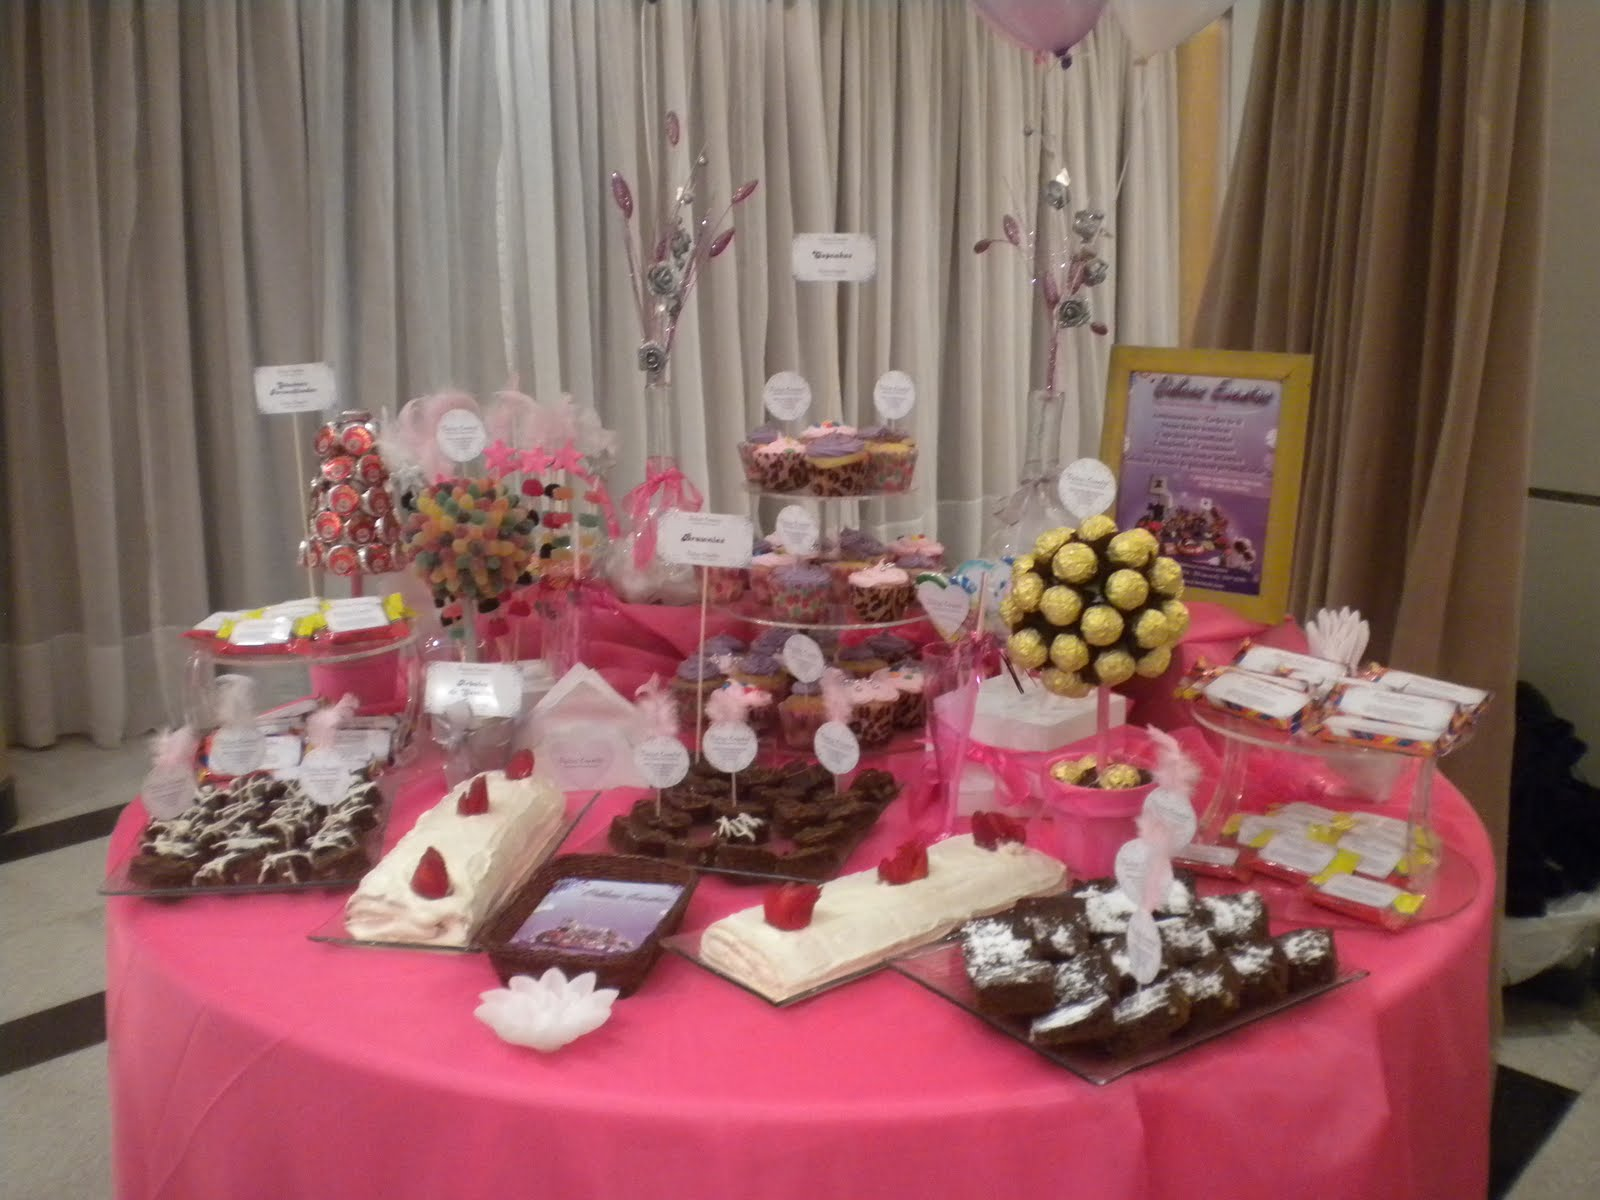 Dulces eventos mesa dulce cumplea os de 15 for Mesas dulces cumpleanos